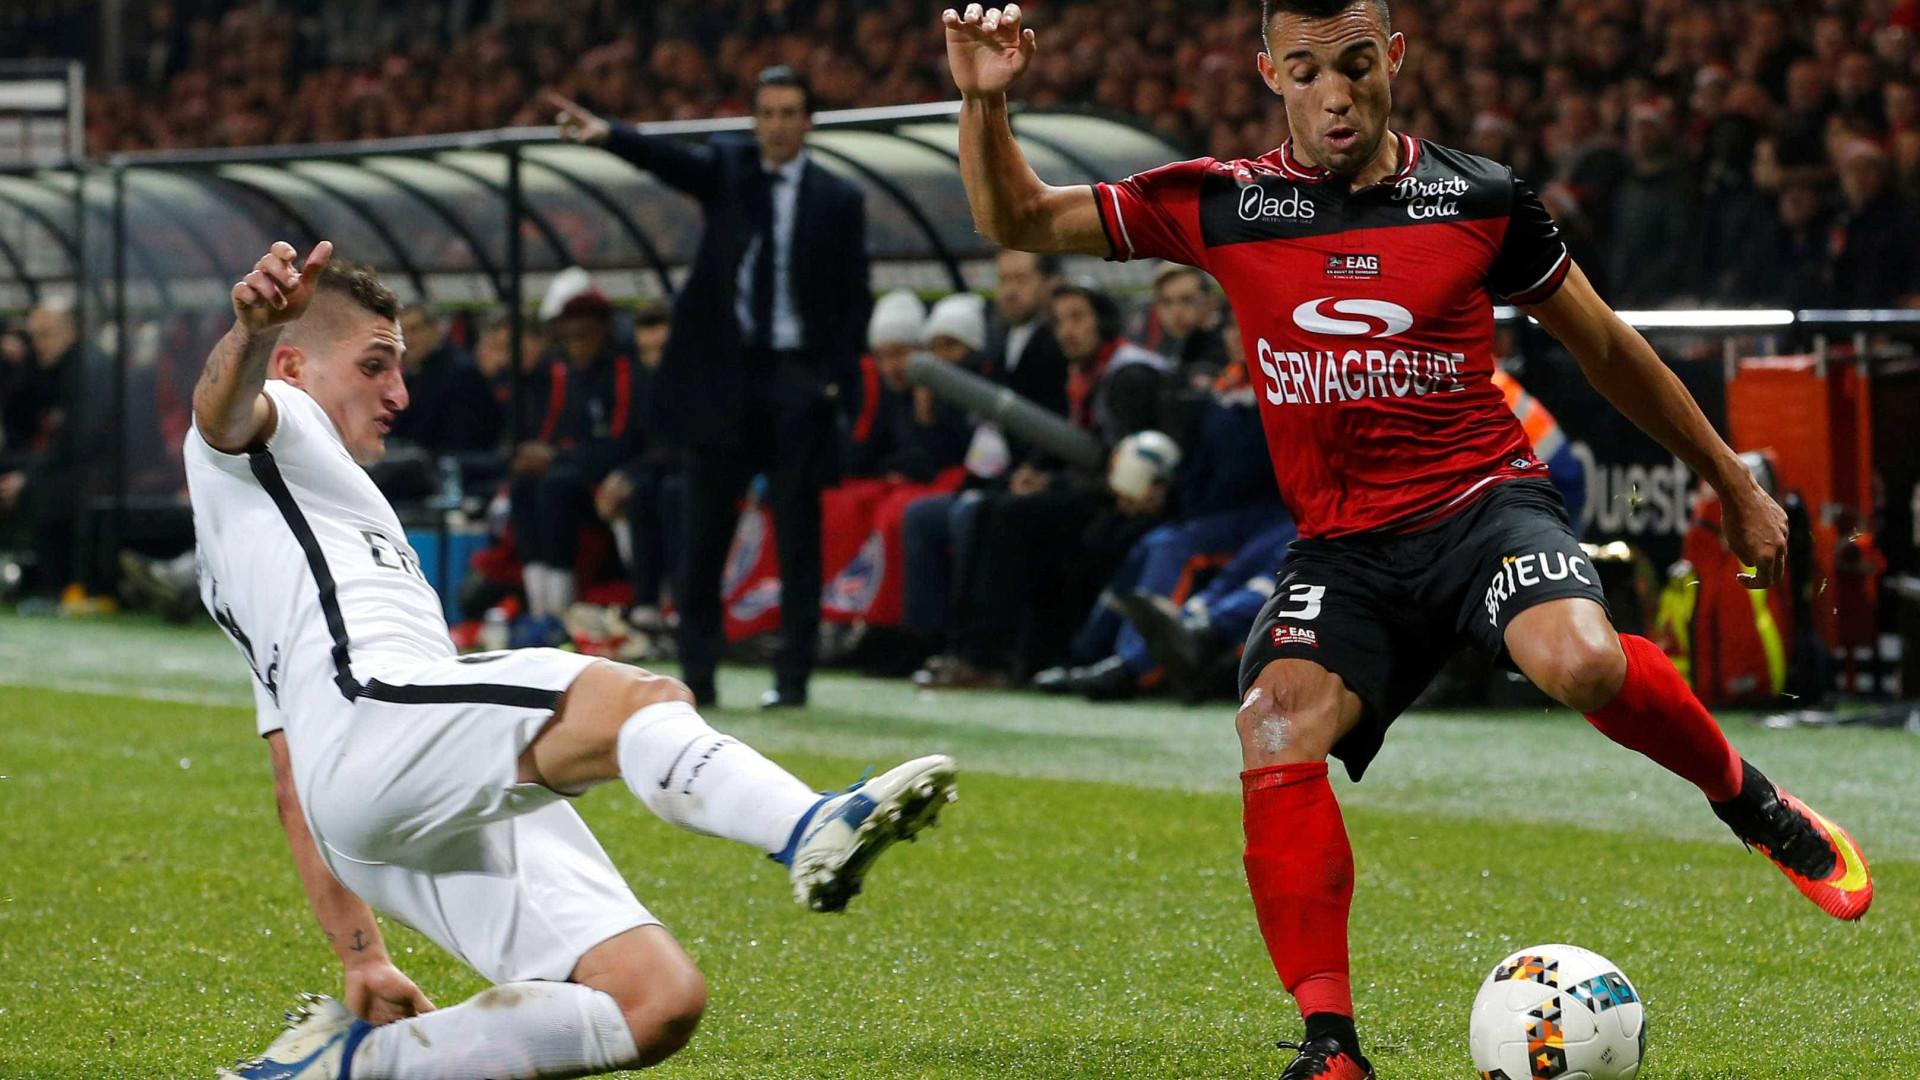 Marçal vendido ao Lyon por 4,5 milhões de euros — Benfica